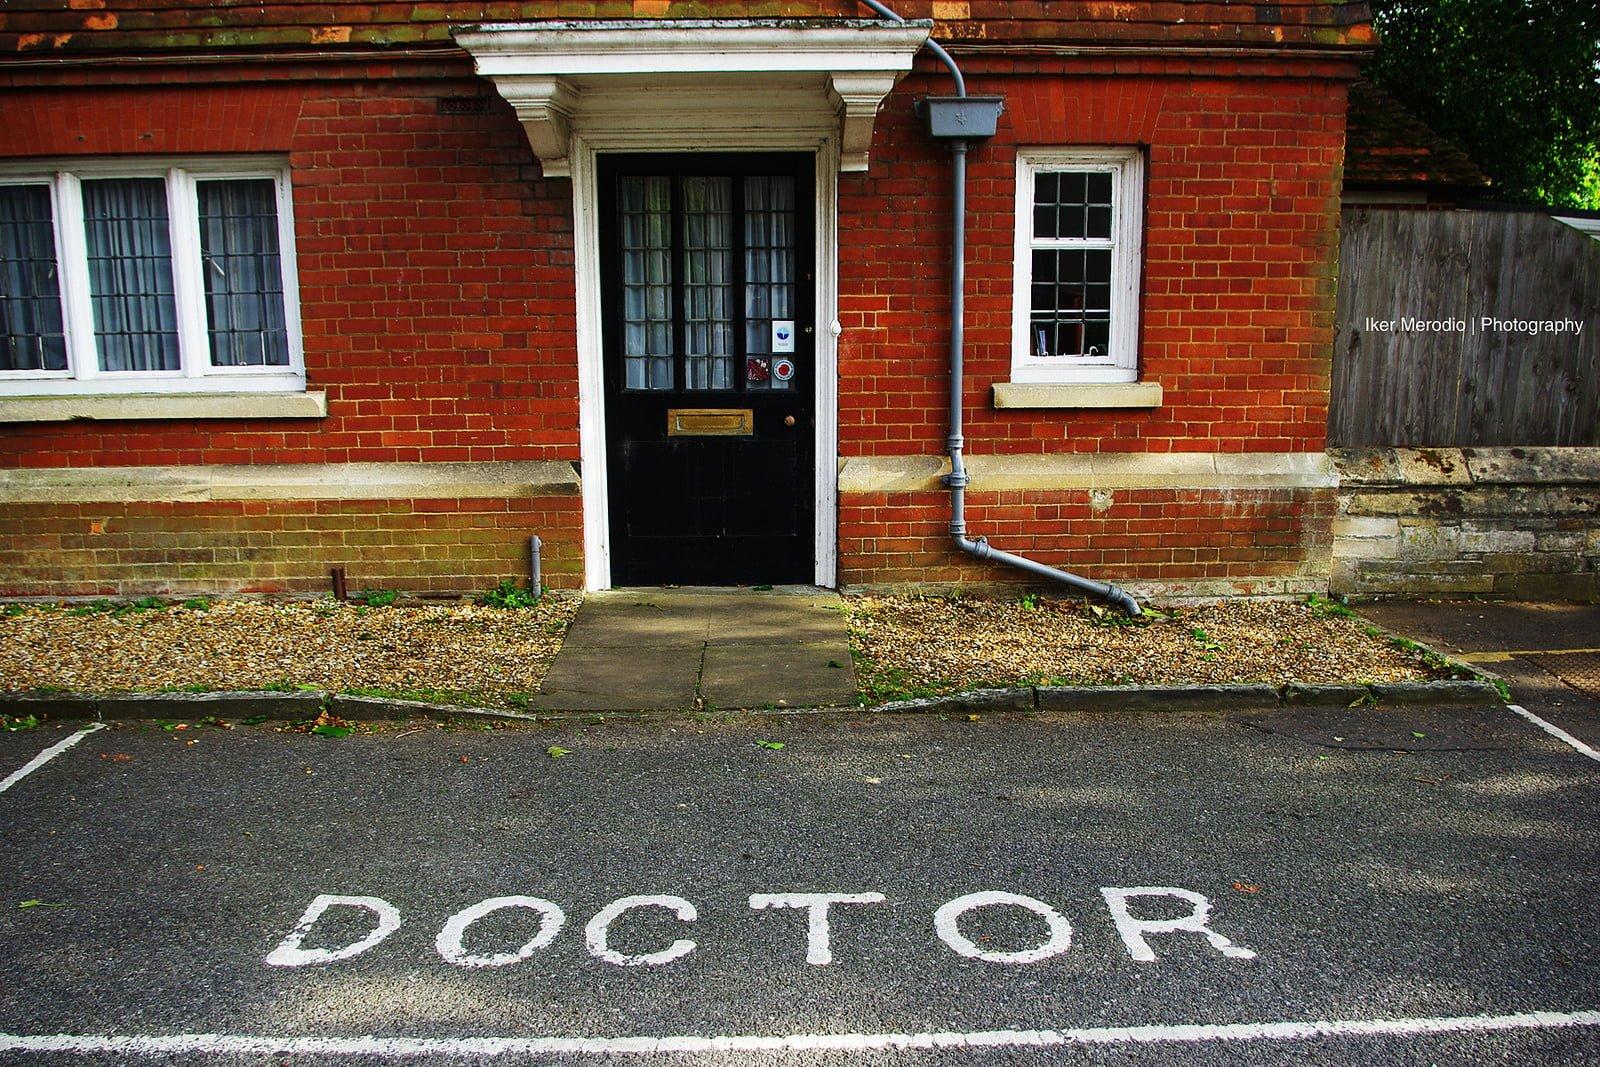 In defence of Victoria's doctors health service